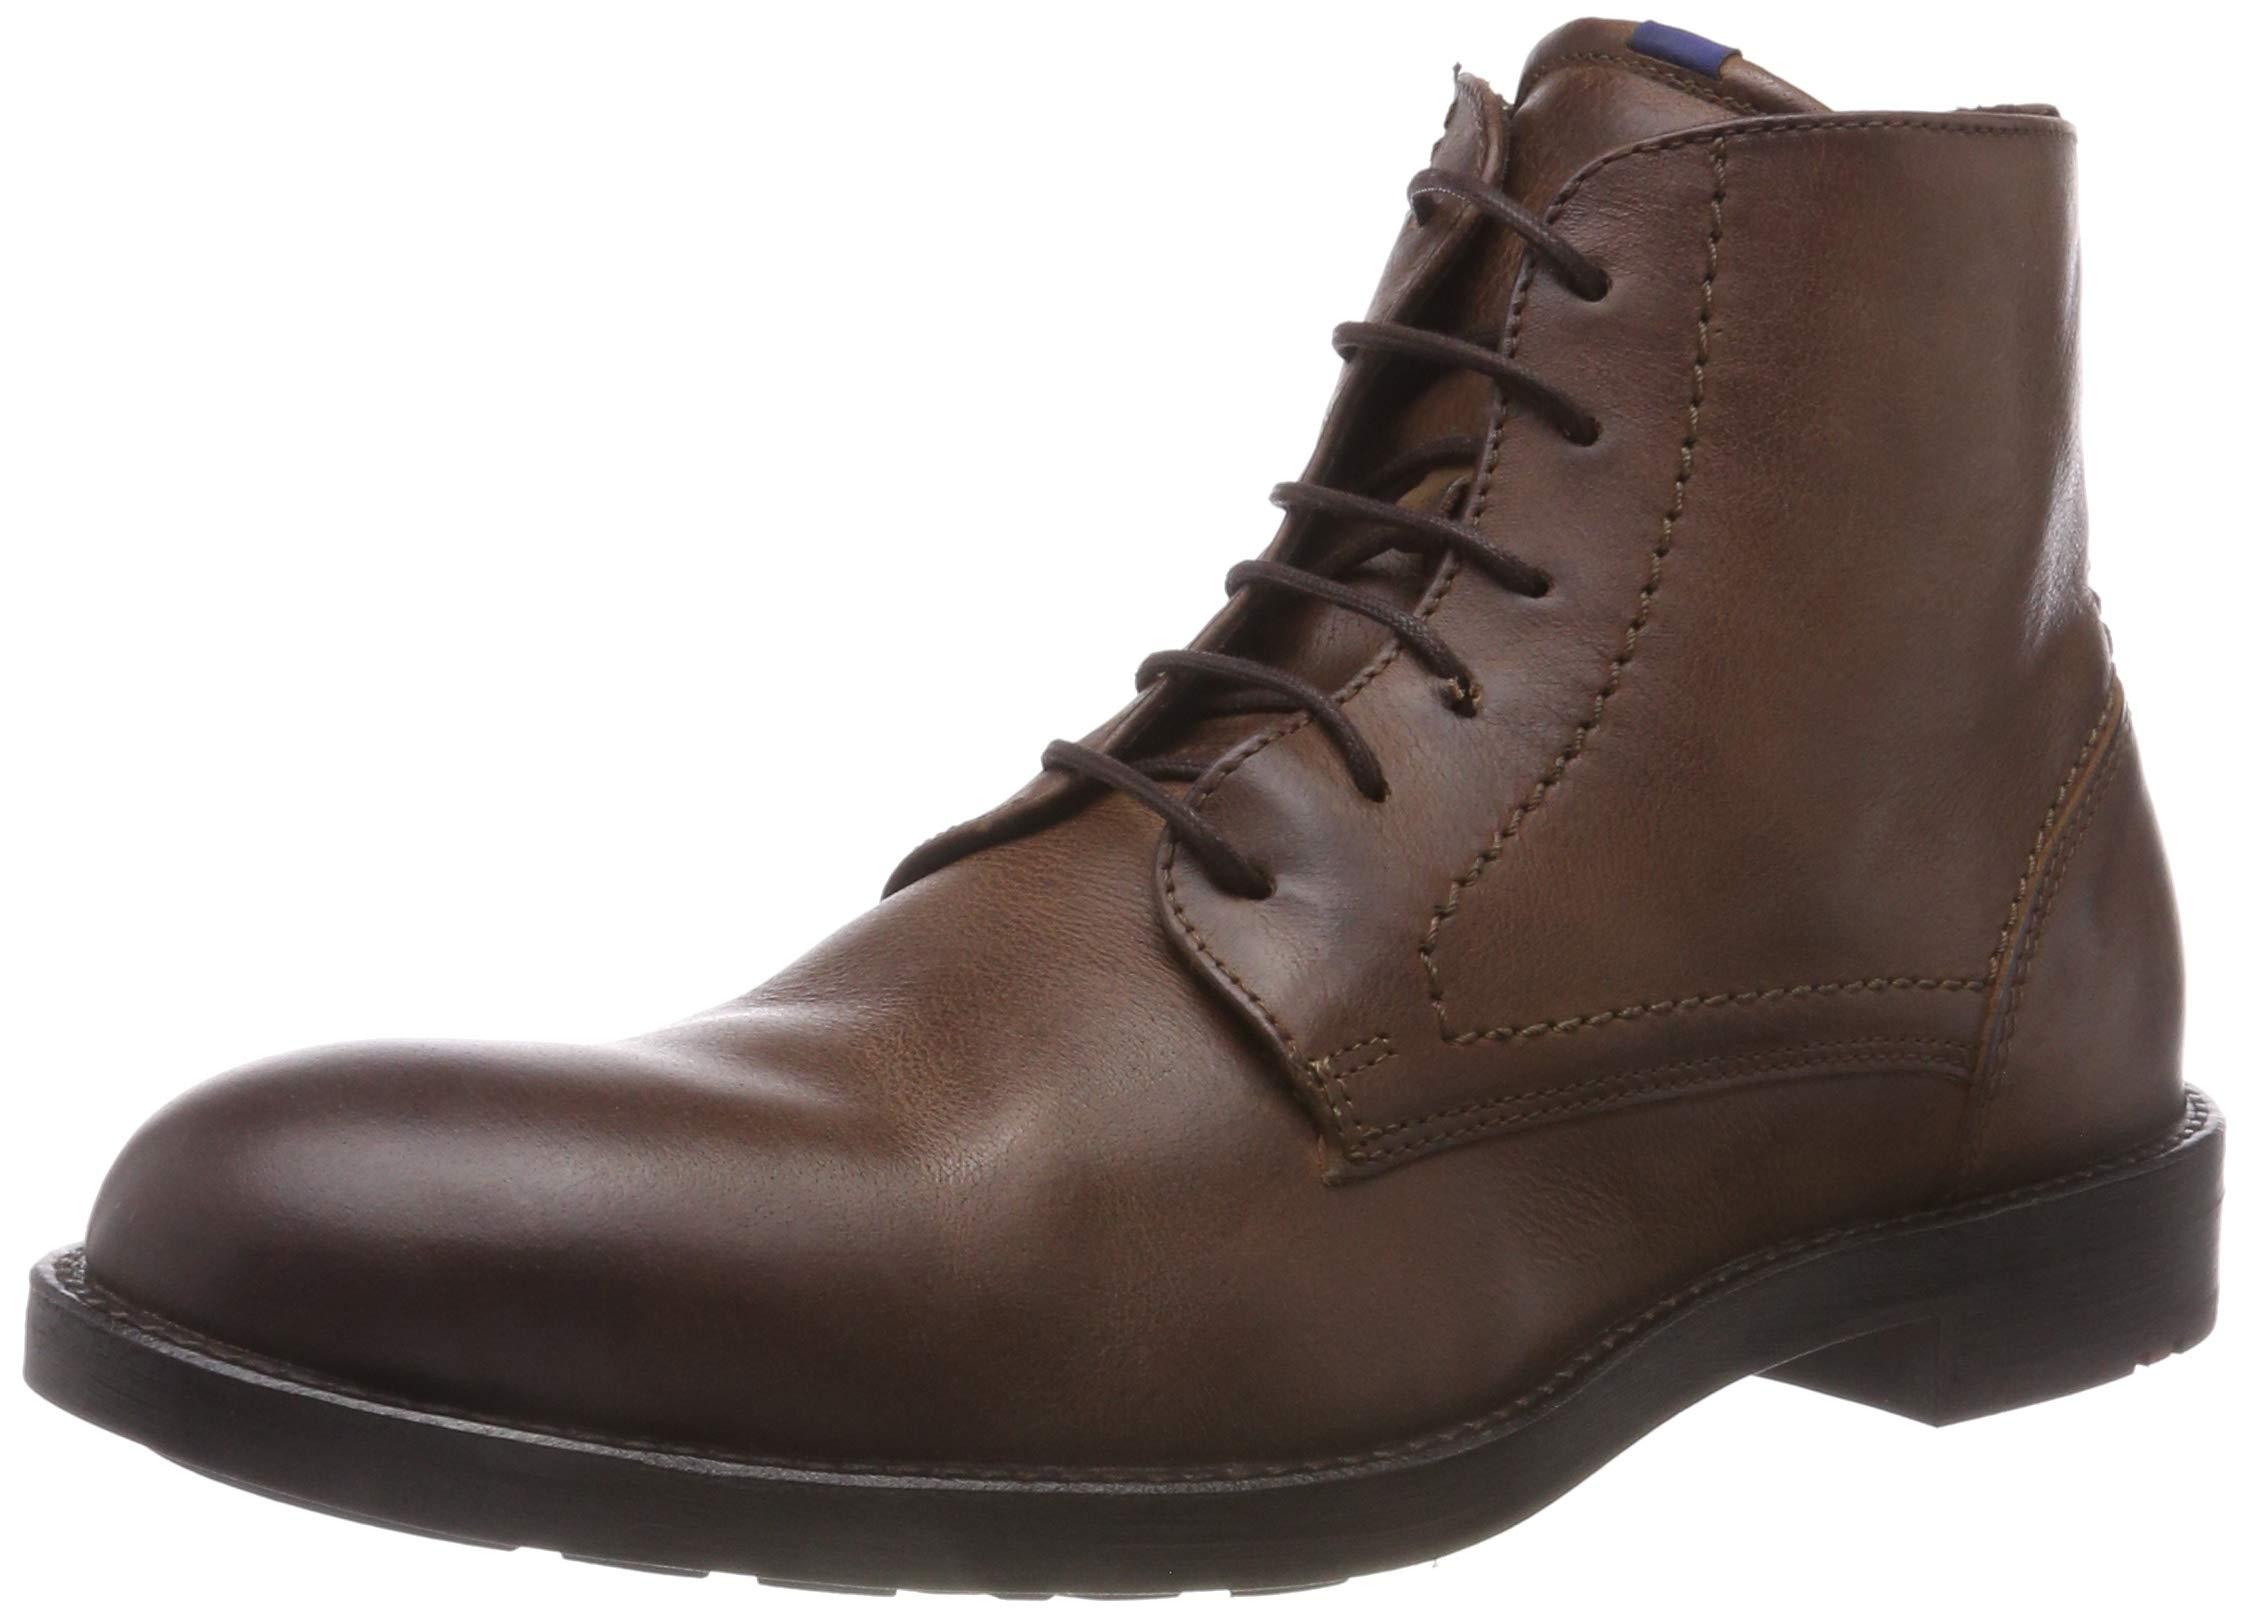 Boots Eu HommeMarronwood Lloyd 442 5 X Mars motionRangers xrCoBde